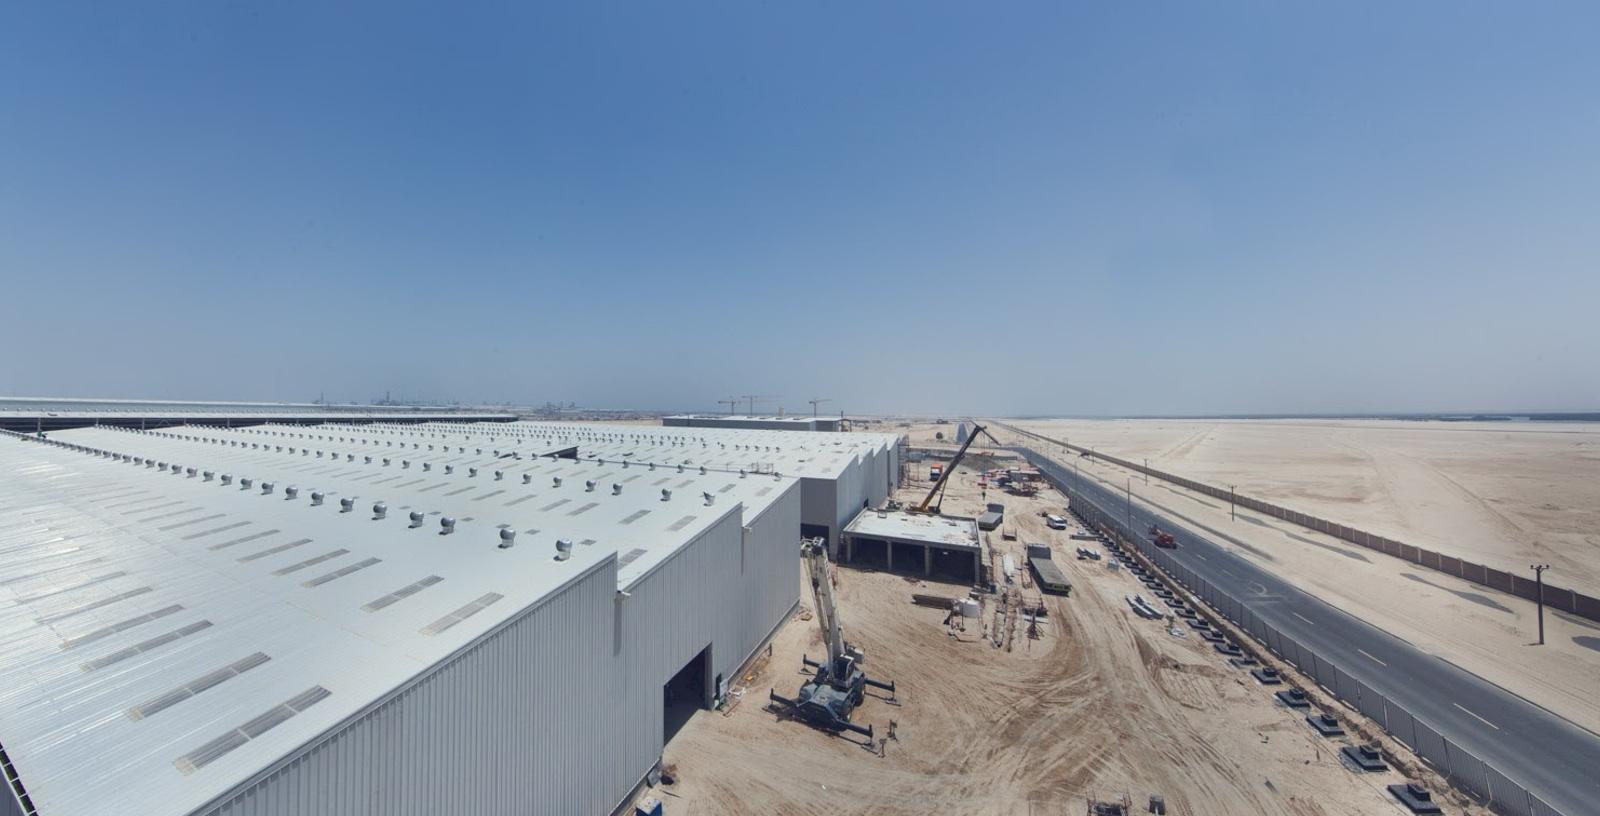 Aluminum_extrusion_plant_Kizad_UAE_Butec_Talex_IDOM_000